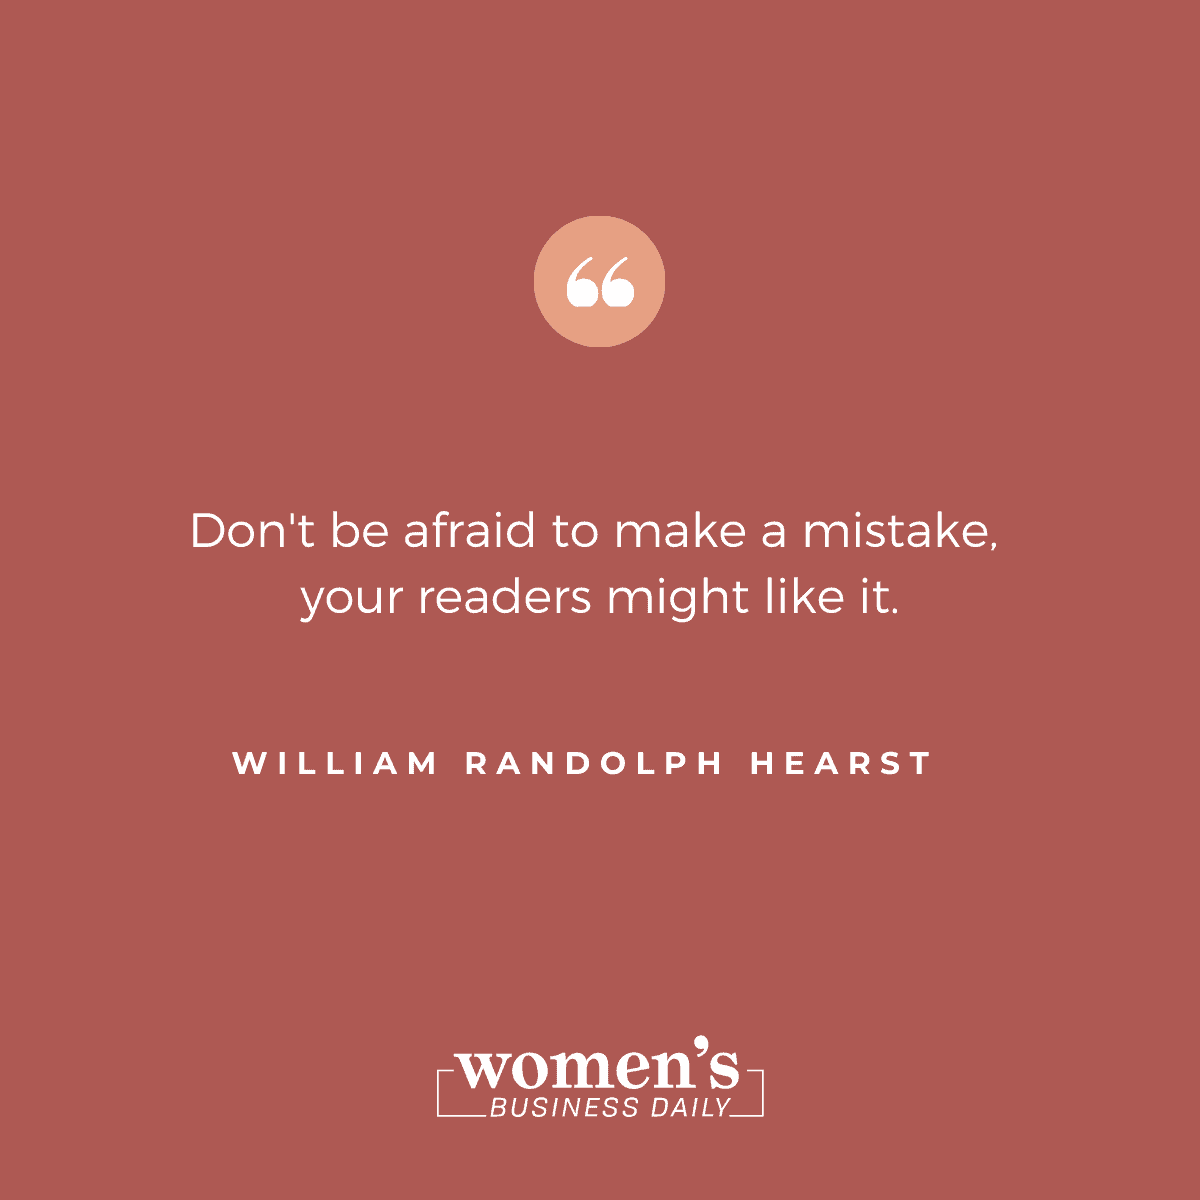 William Randolph Hearst Quote